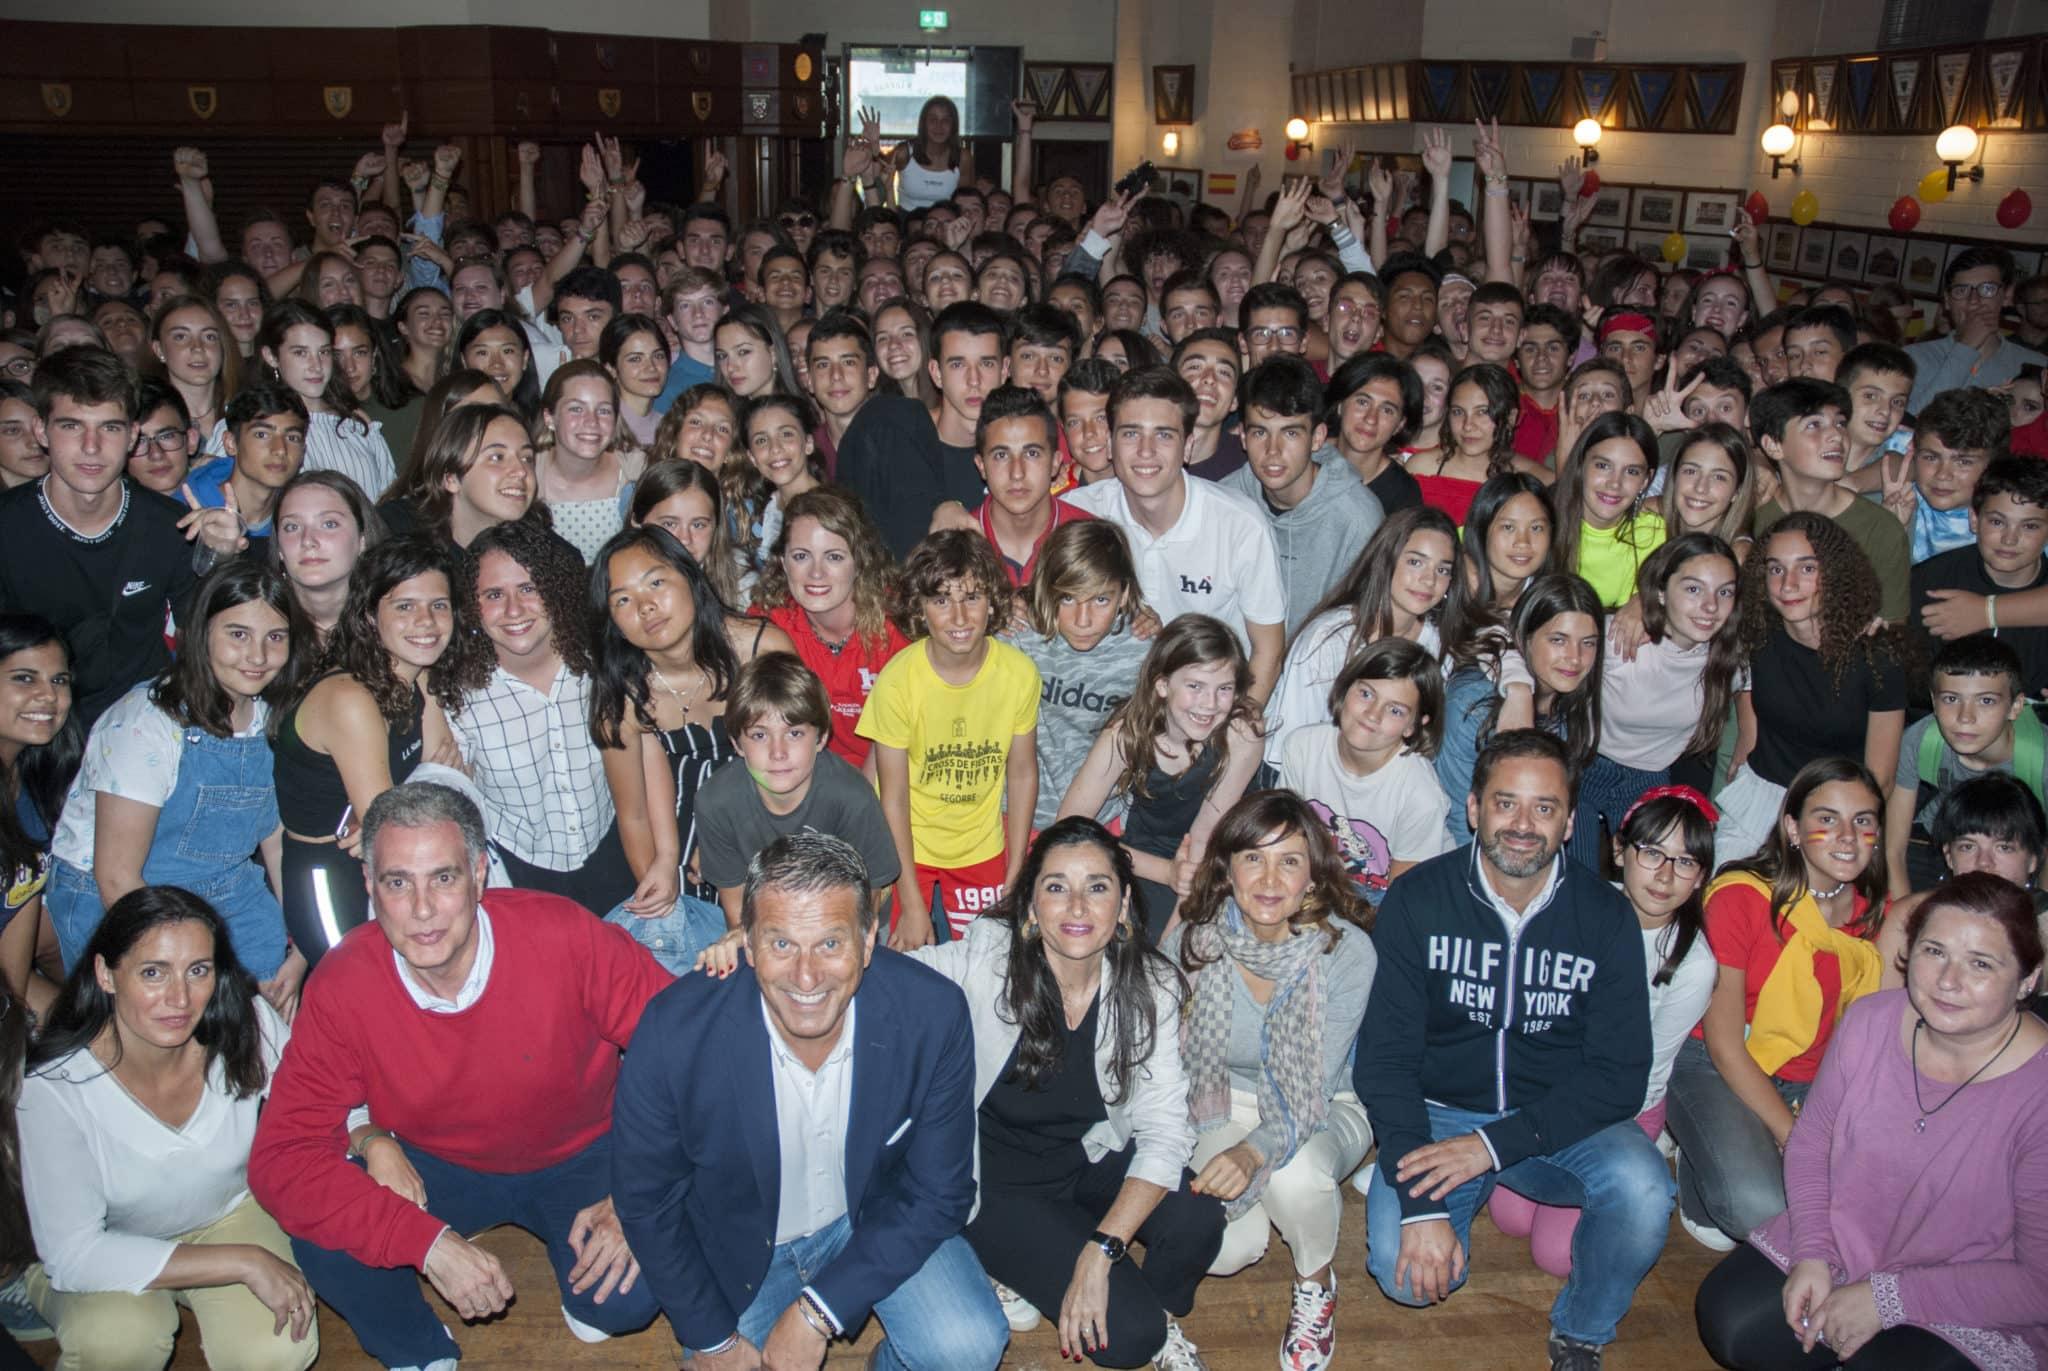 https://blog.globalcaja.es/wp-content/uploads/2019/07/SUE-grupo-2.jpg